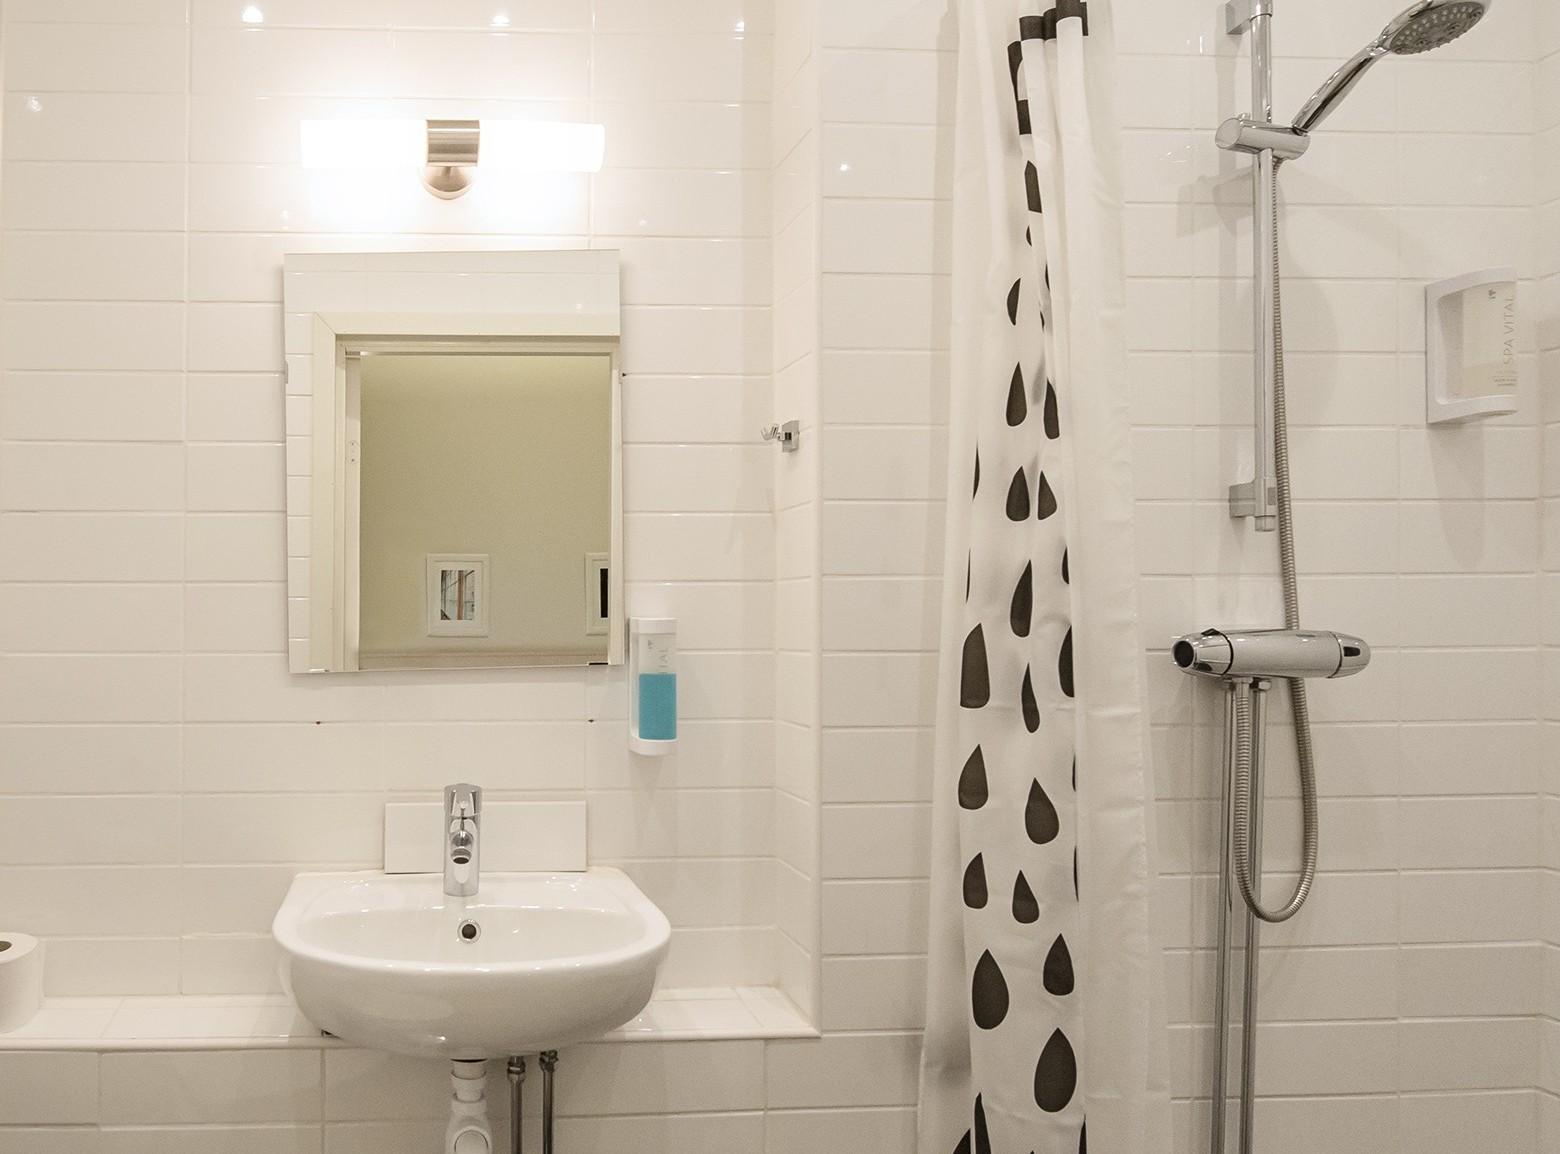 Unique Hotel - Hotel Stockholm City | Dubbelrum | Unique Hotel : fönster i dusch : Fönster